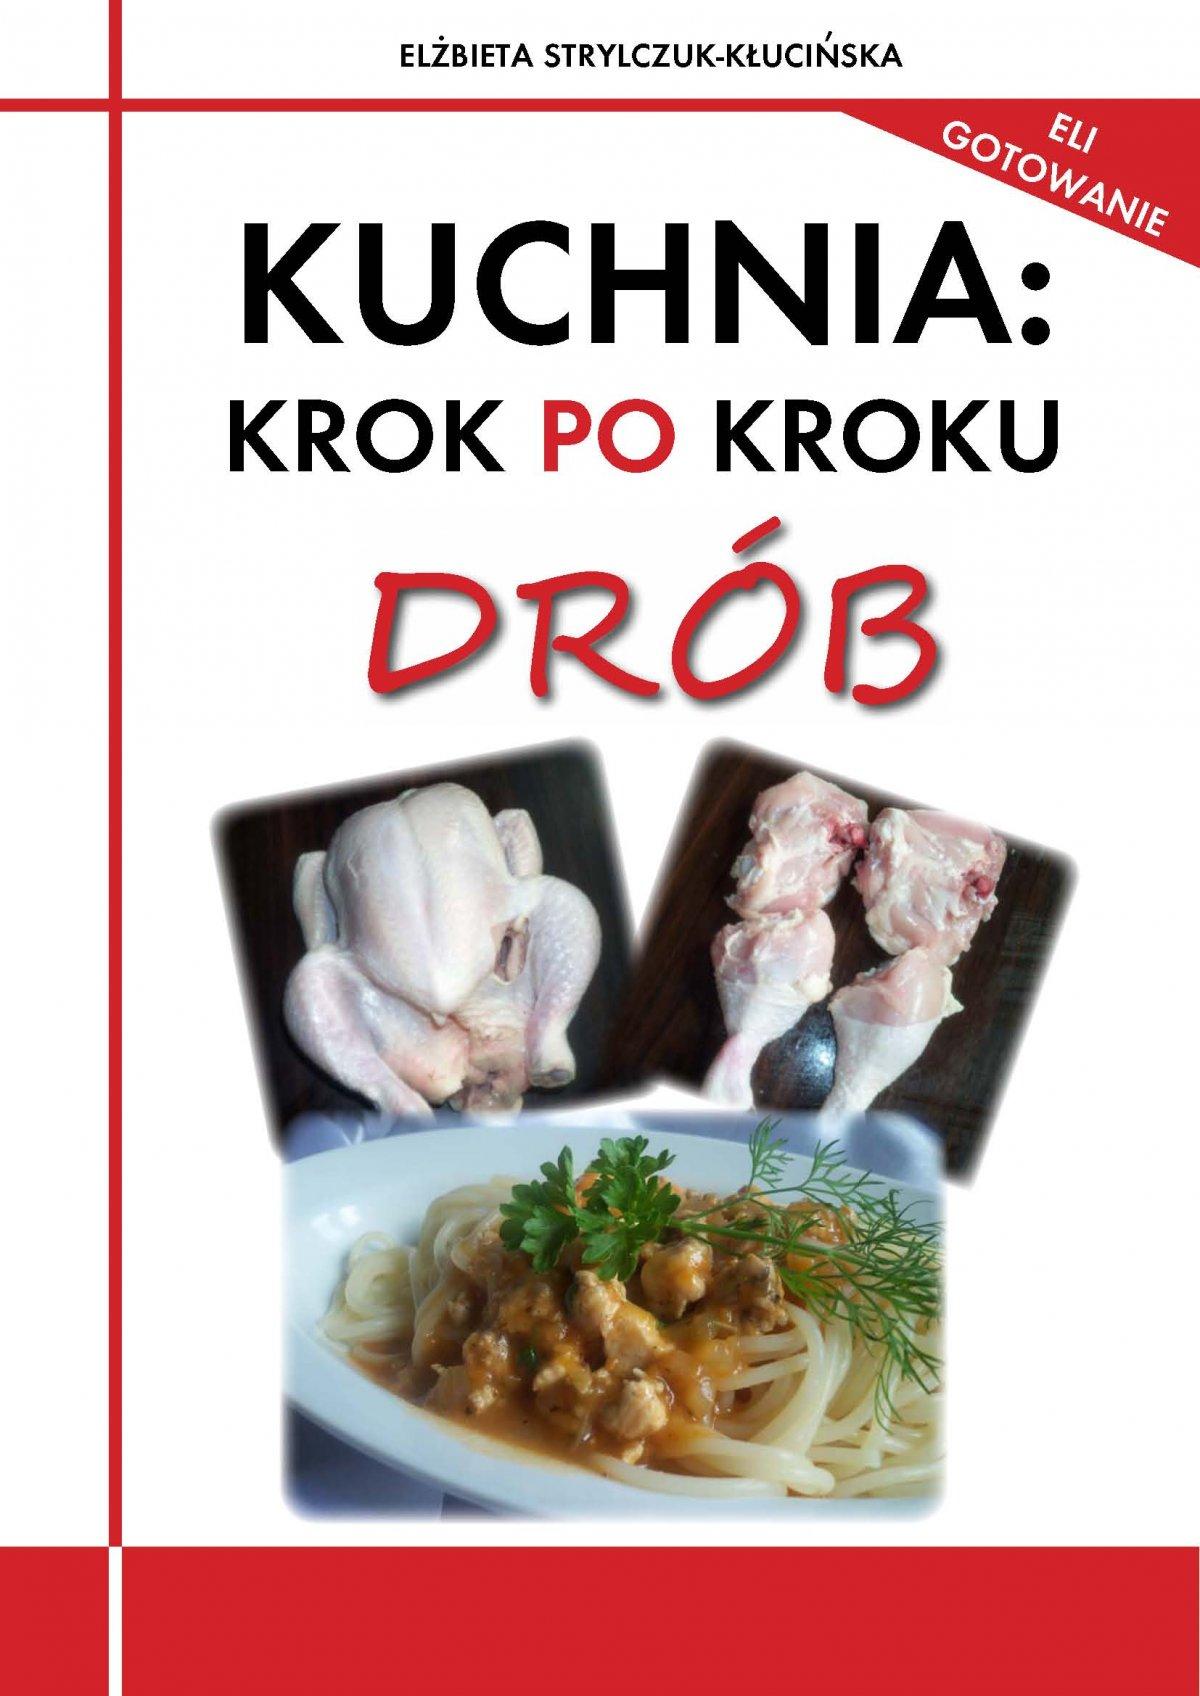 Kuchnia: krok po kroku. Drób - Ebook (Książka PDF) do pobrania w formacie PDF